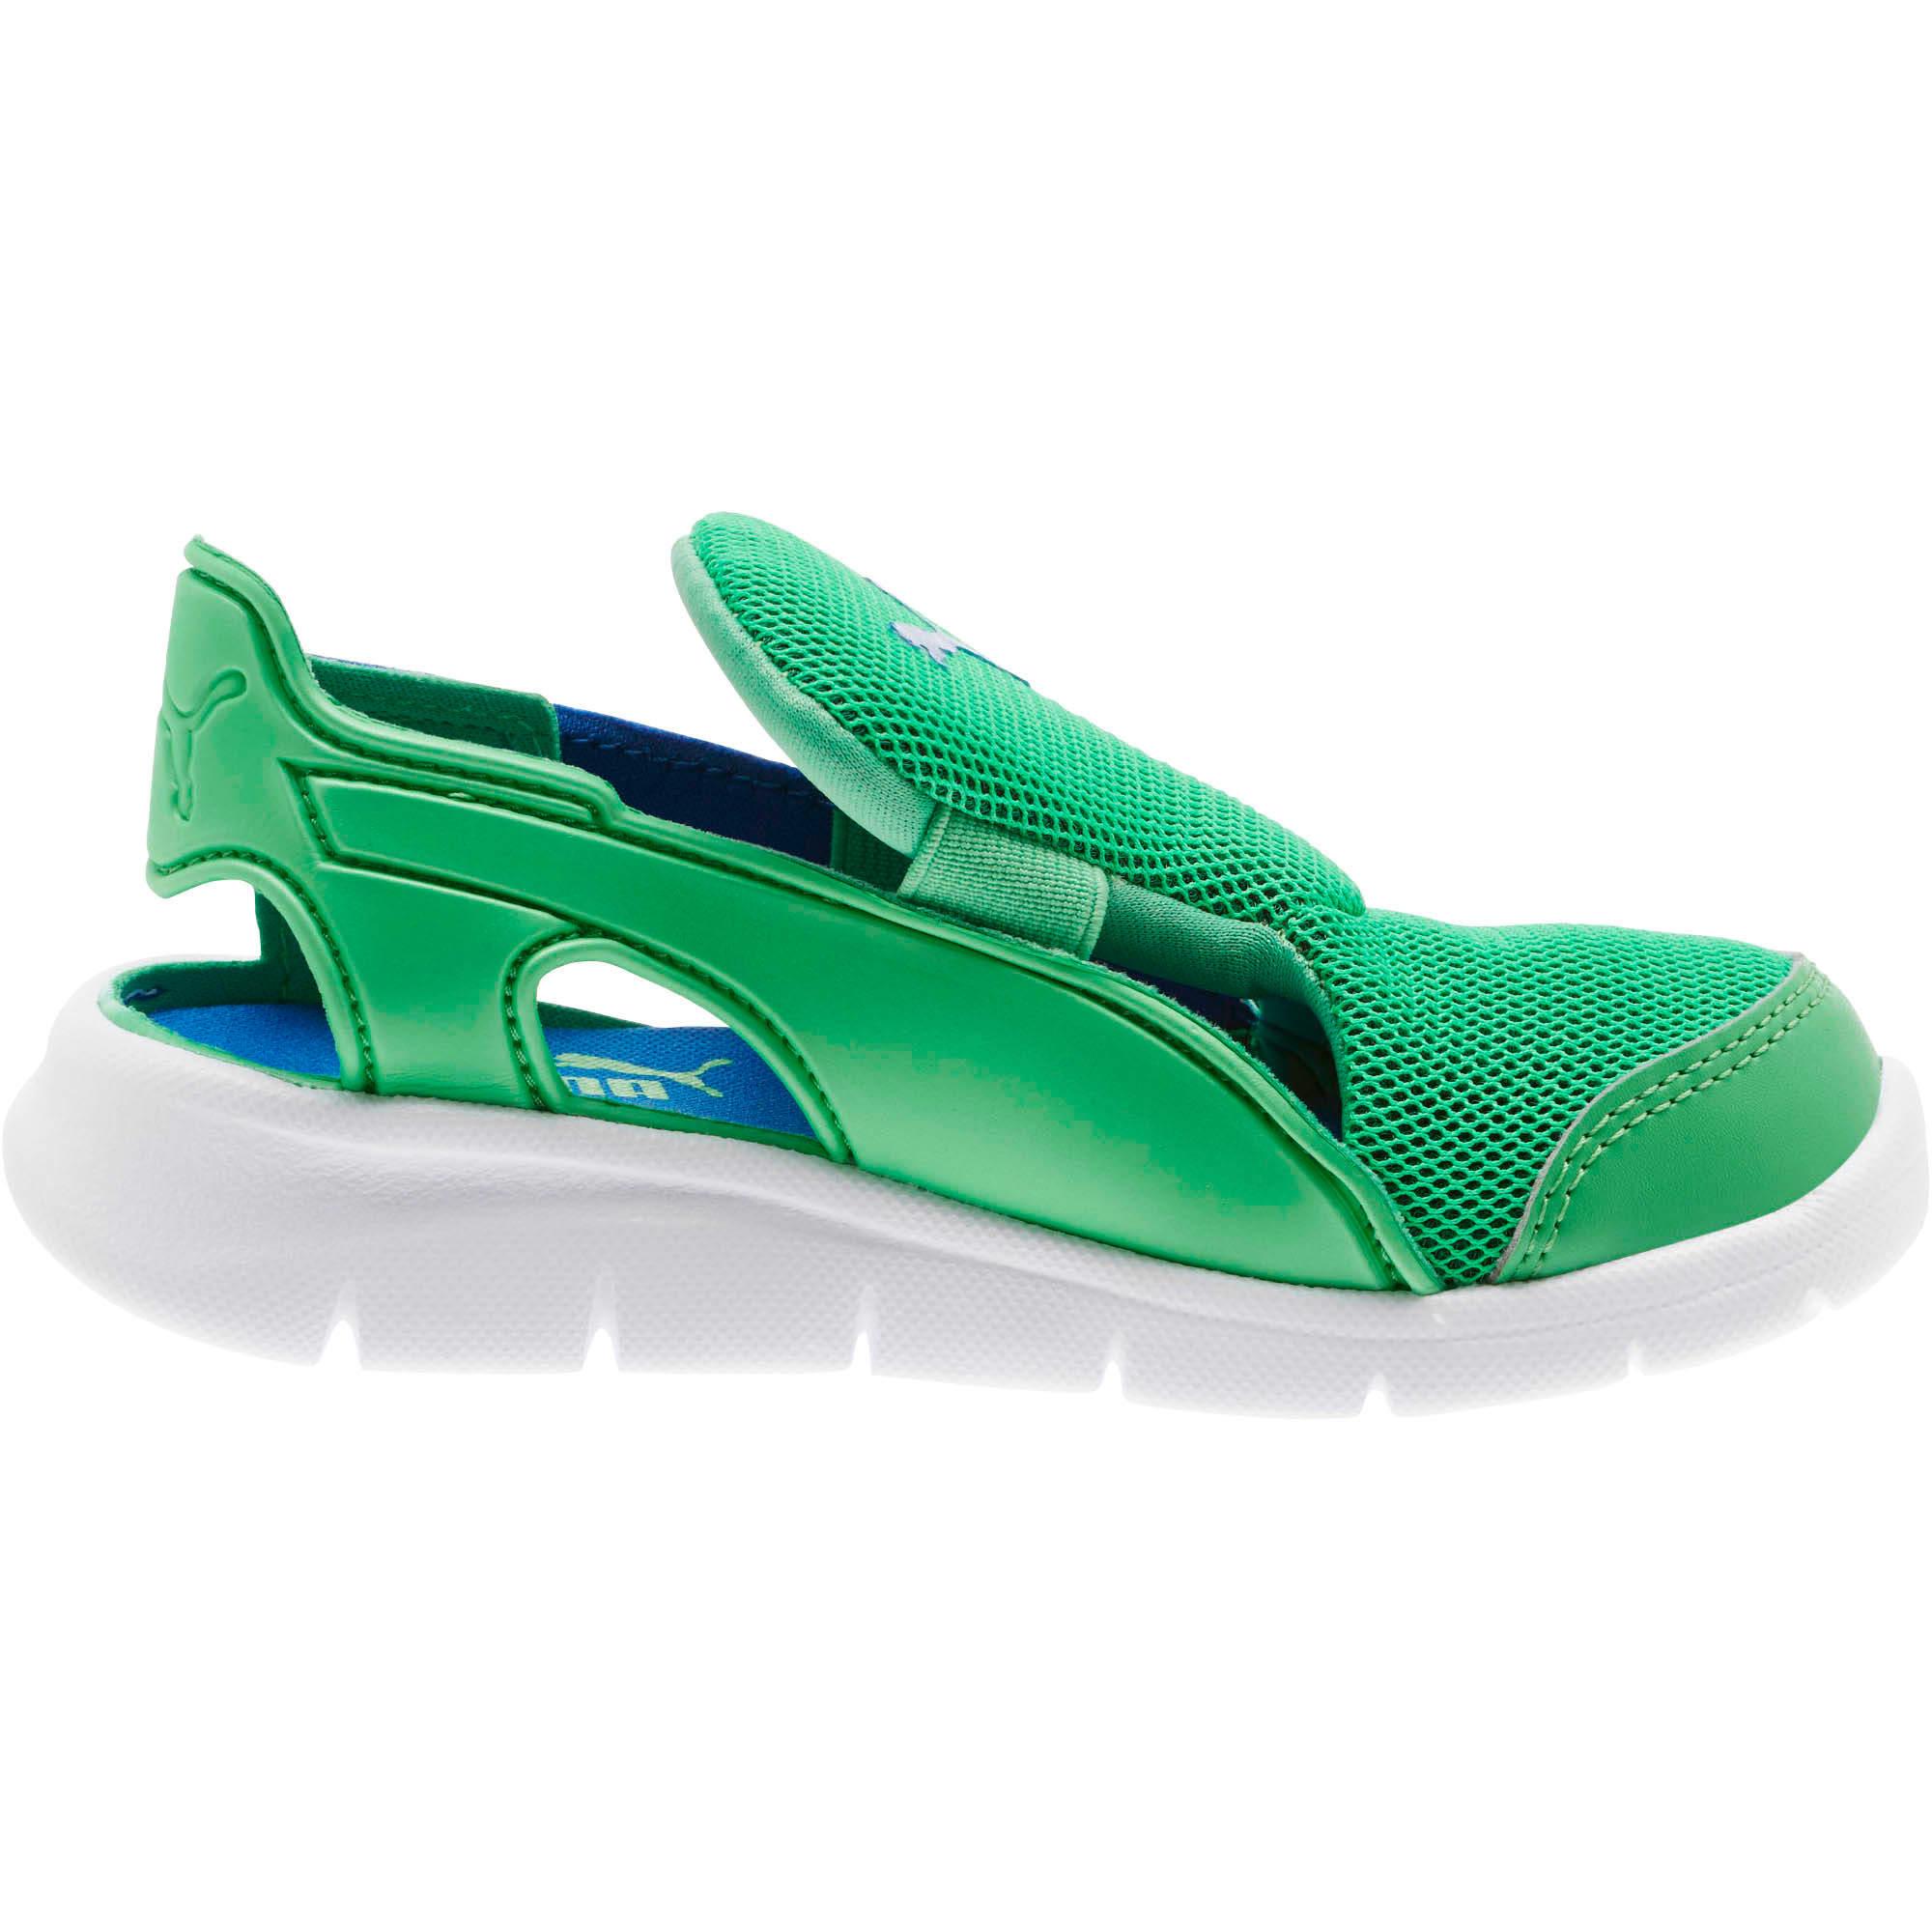 Thumbnail 3 of Bao 3 Open Little Kids' Shoes, Surf The Web-Irish Green, medium